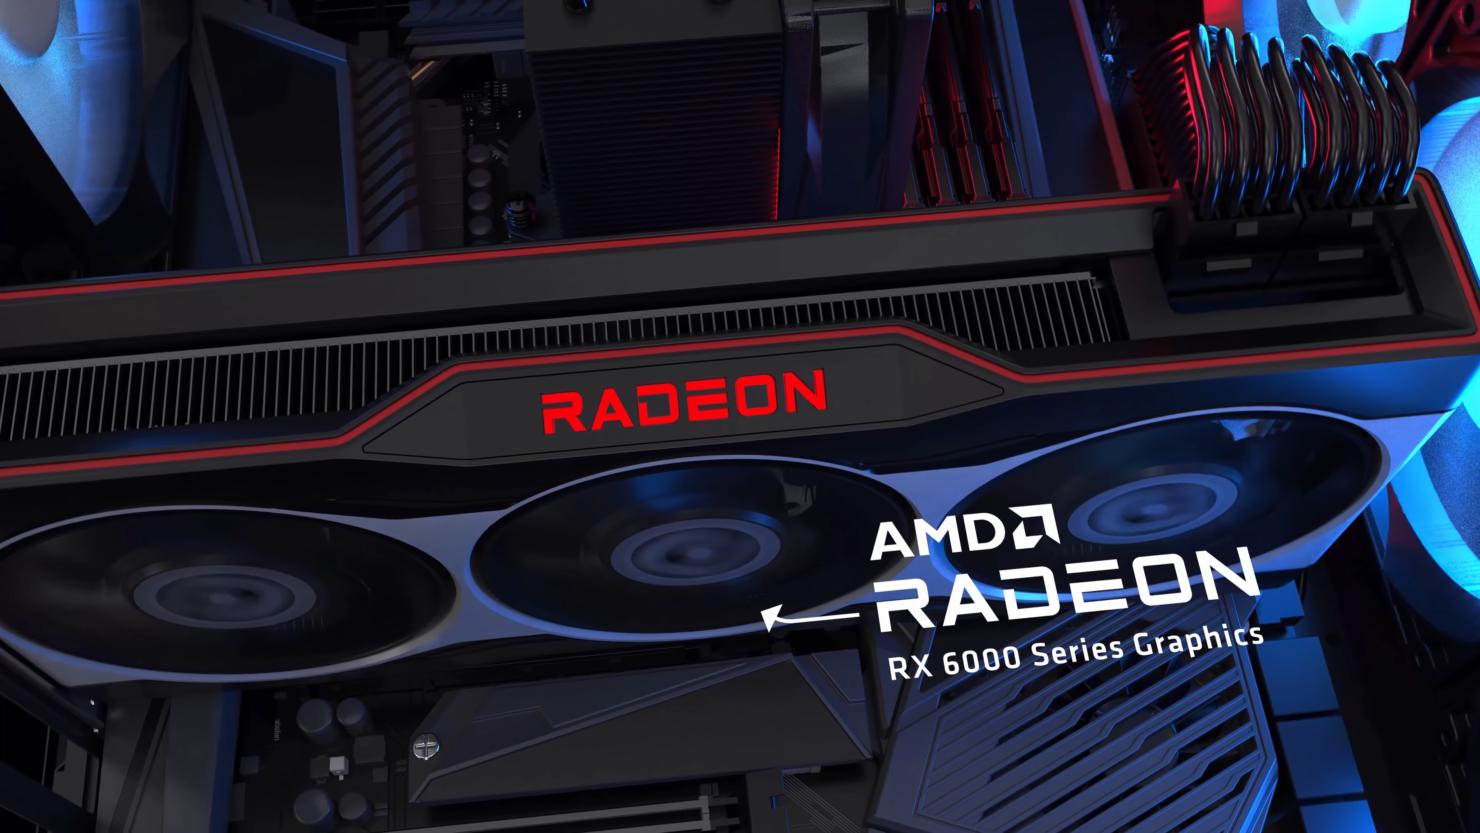 AMD Radeon RX 6700 XT с 12 ГБ памяти GDDR6 будет нацелена на 1440p гейминг